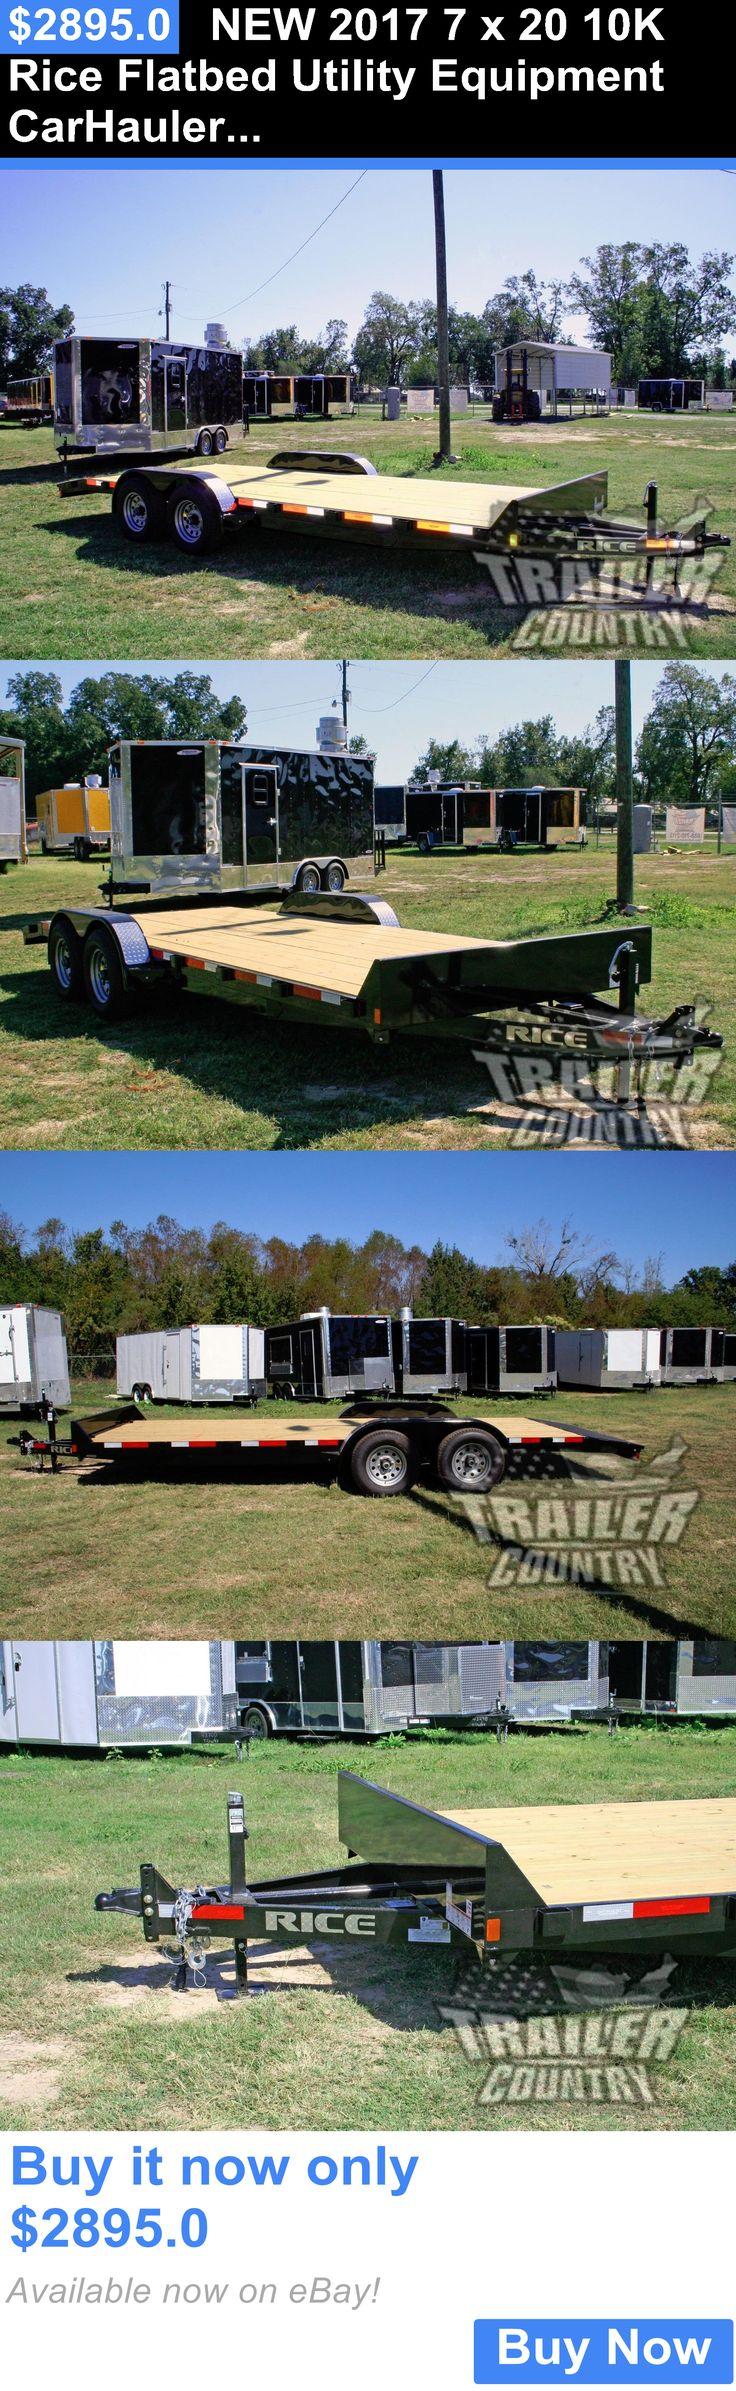 heavy equipment: New 2017 7 X 20 10K Rice Flatbed Utility Equipment Carhauler Car Hauler Trailer BUY IT NOW ONLY: $2895.0